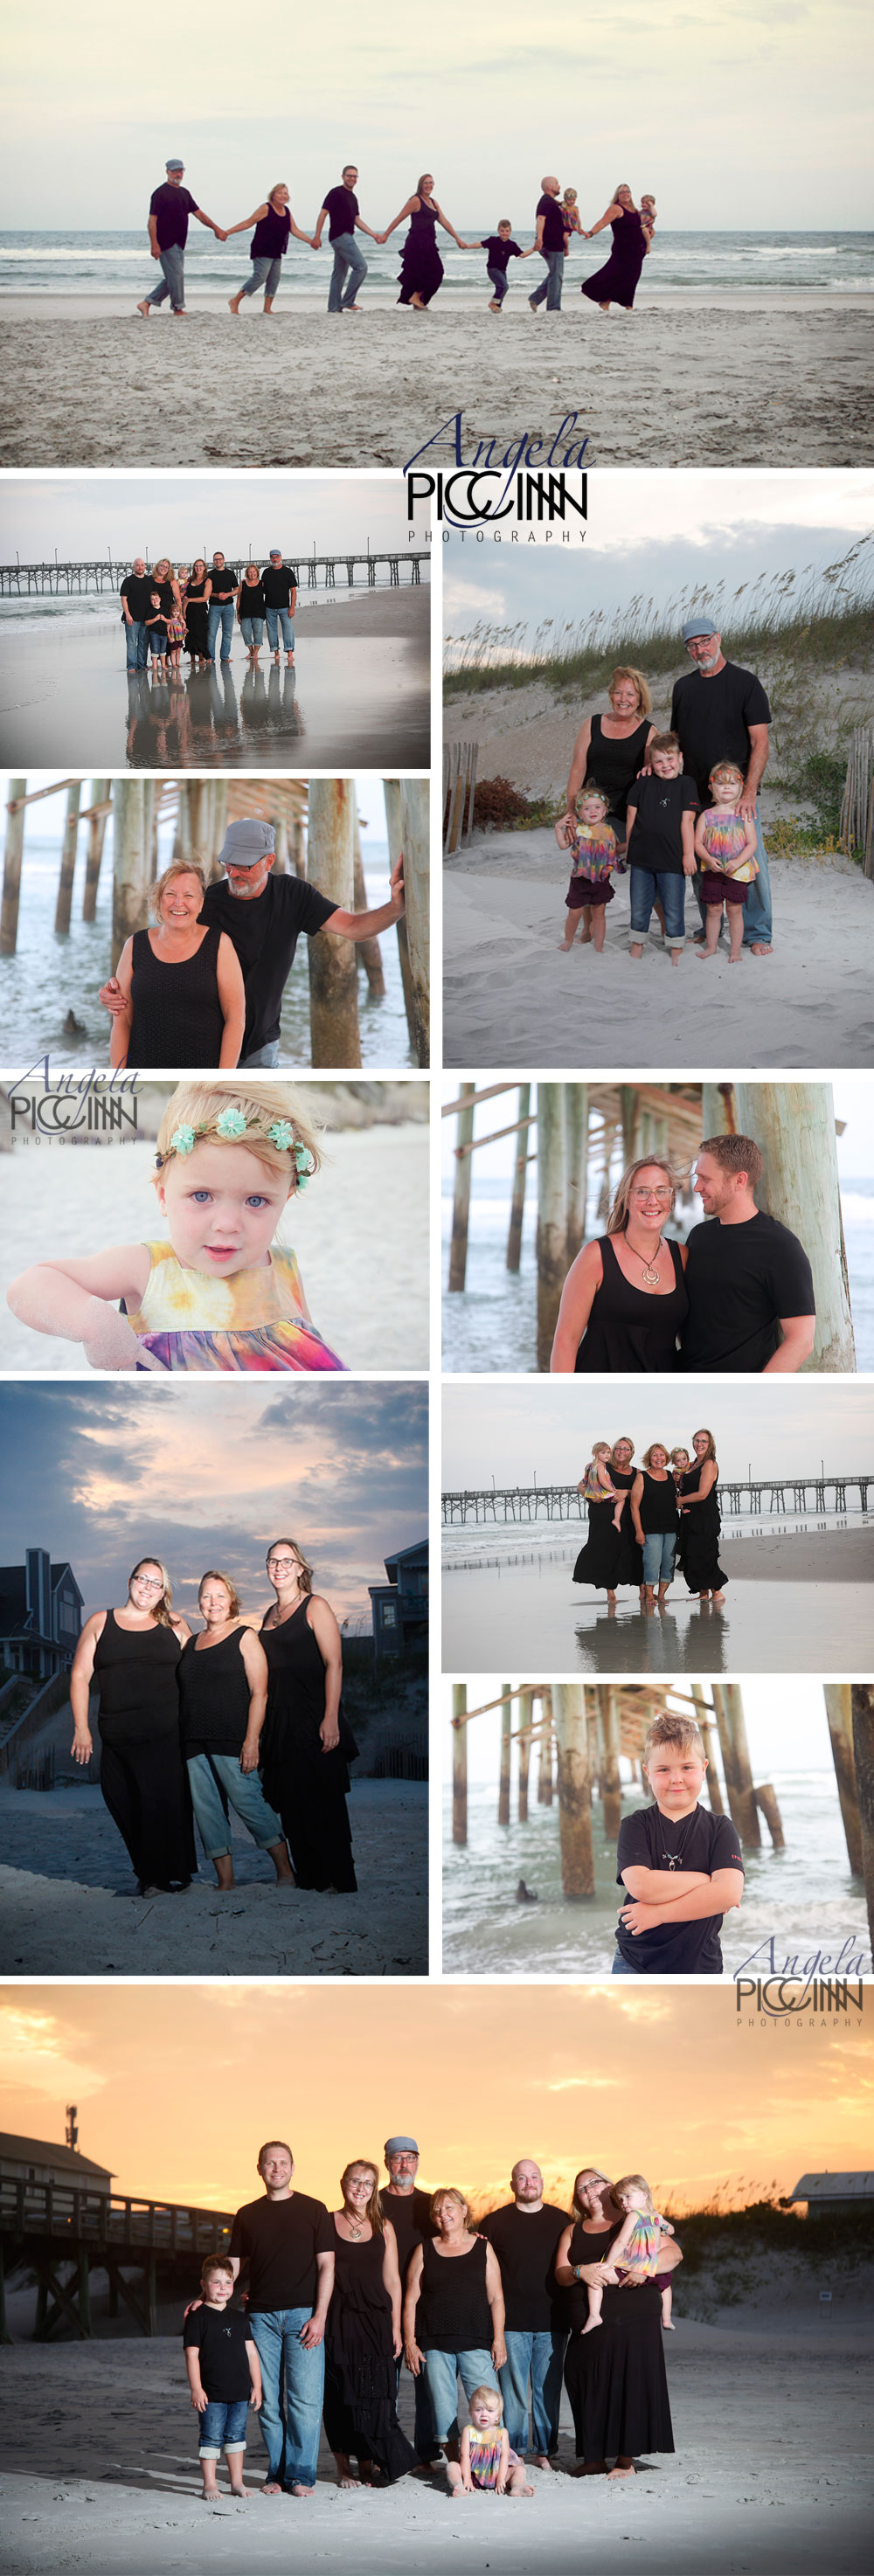 Surf City Family Portraits by Angela Piccinin